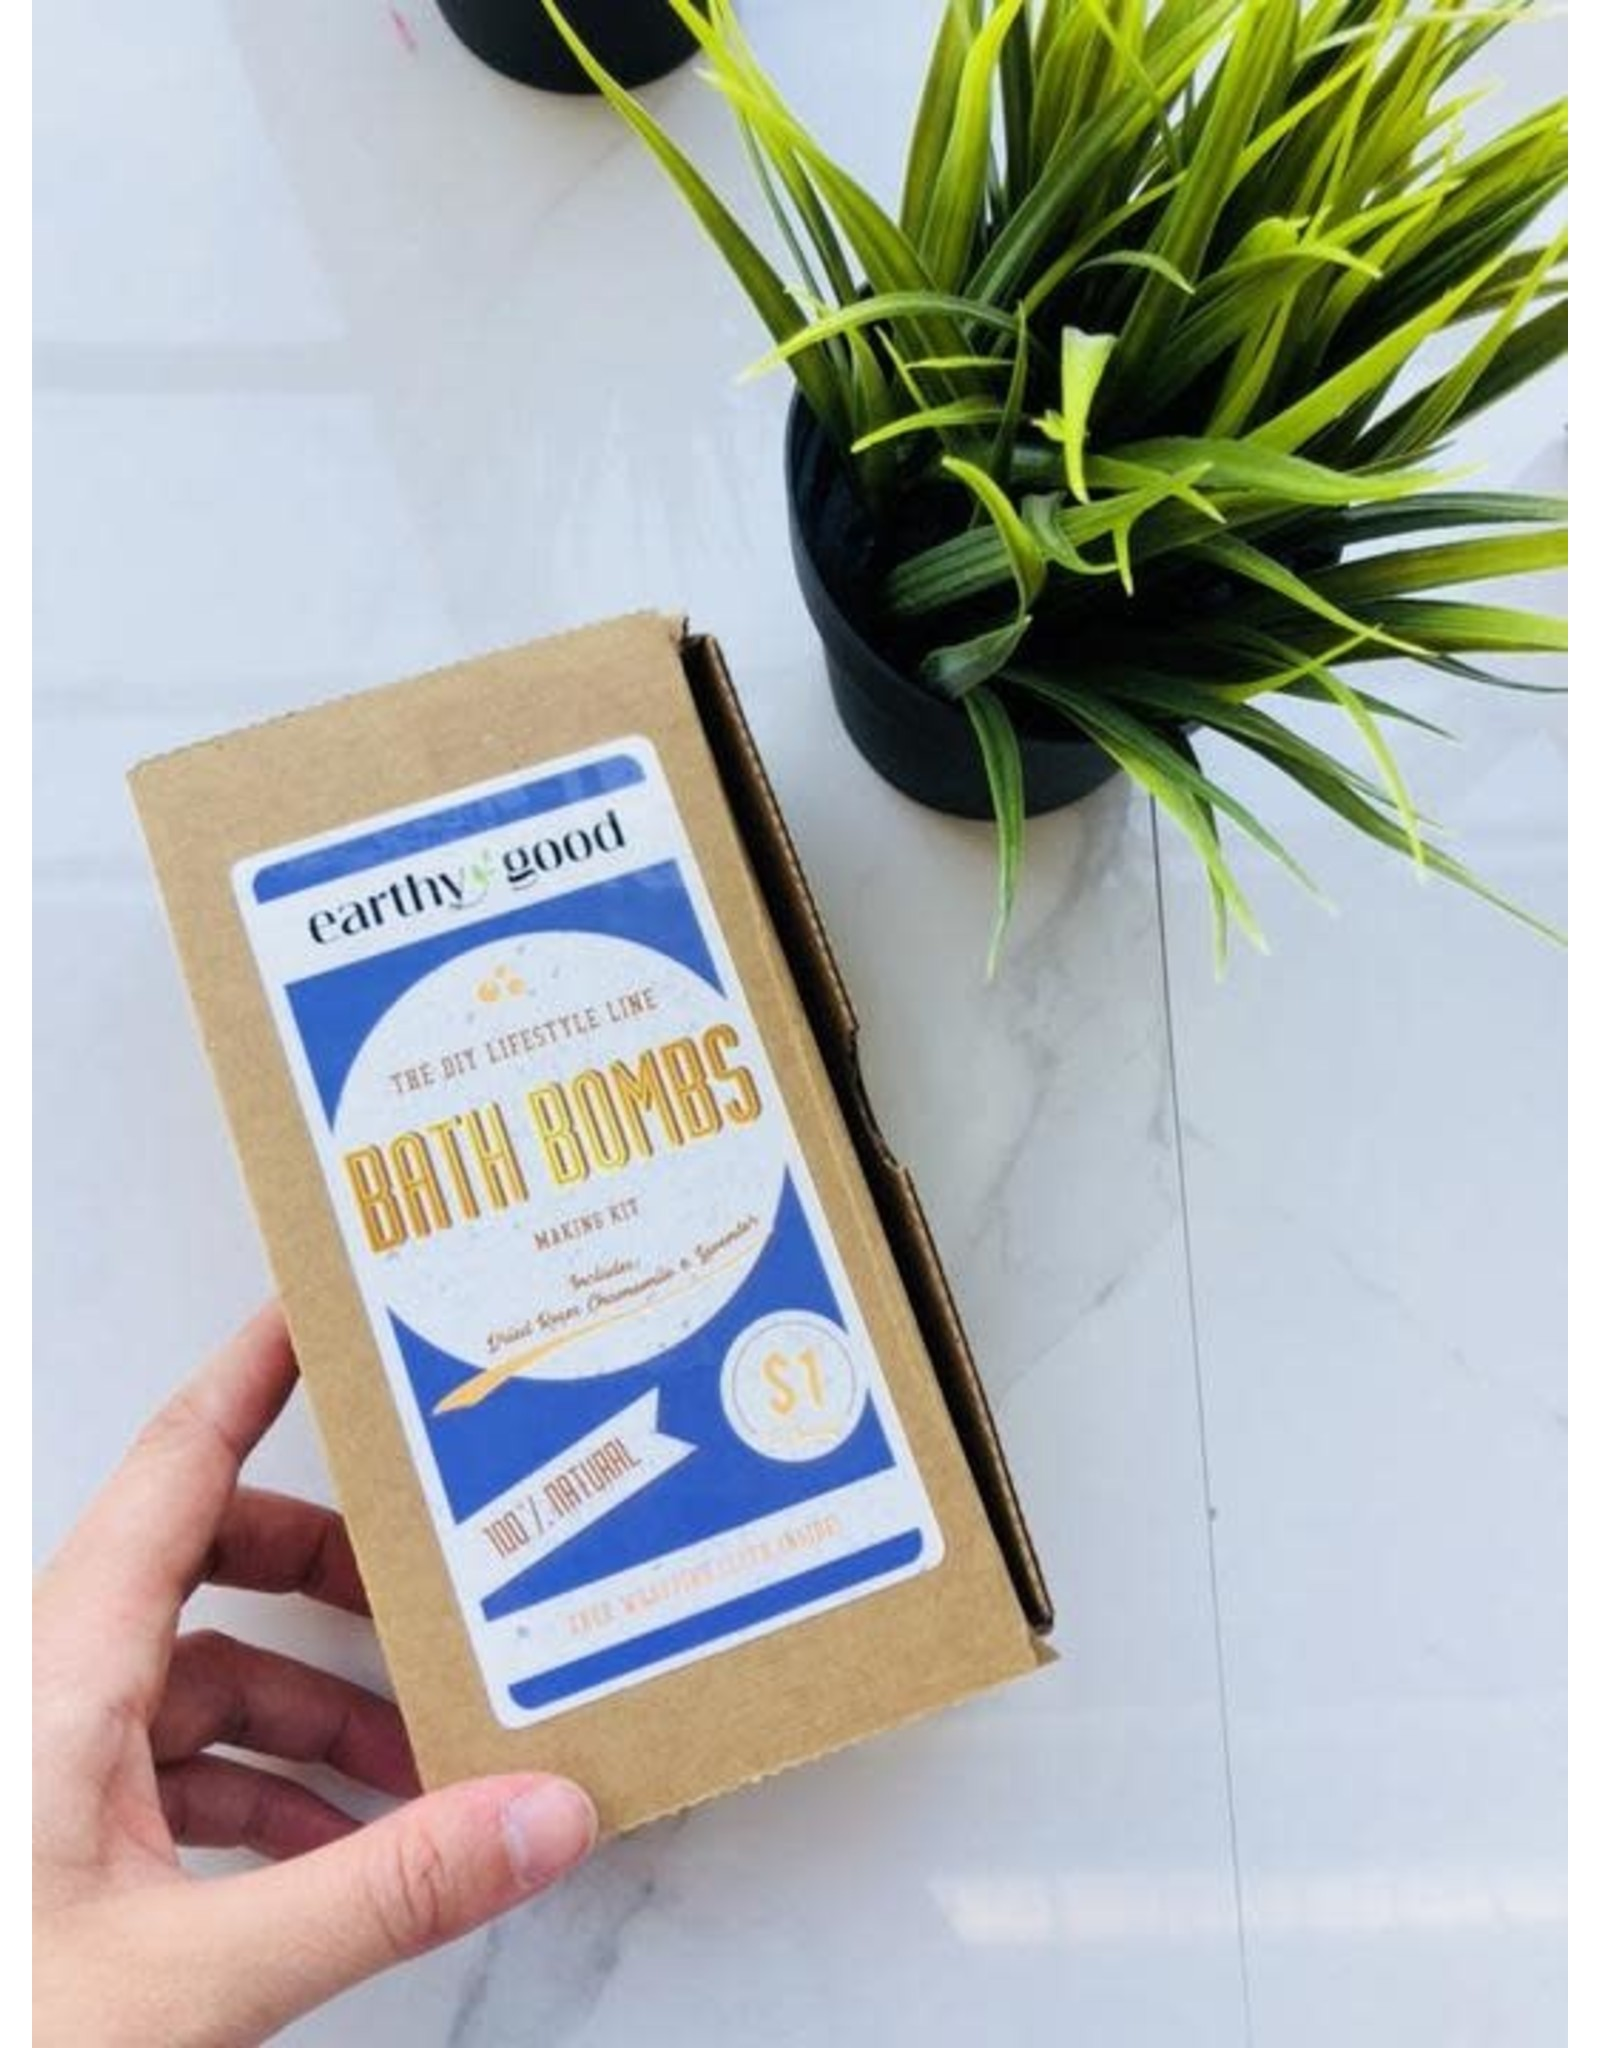 KISS NATURALS earthy good DIY Bath Bomb Kit